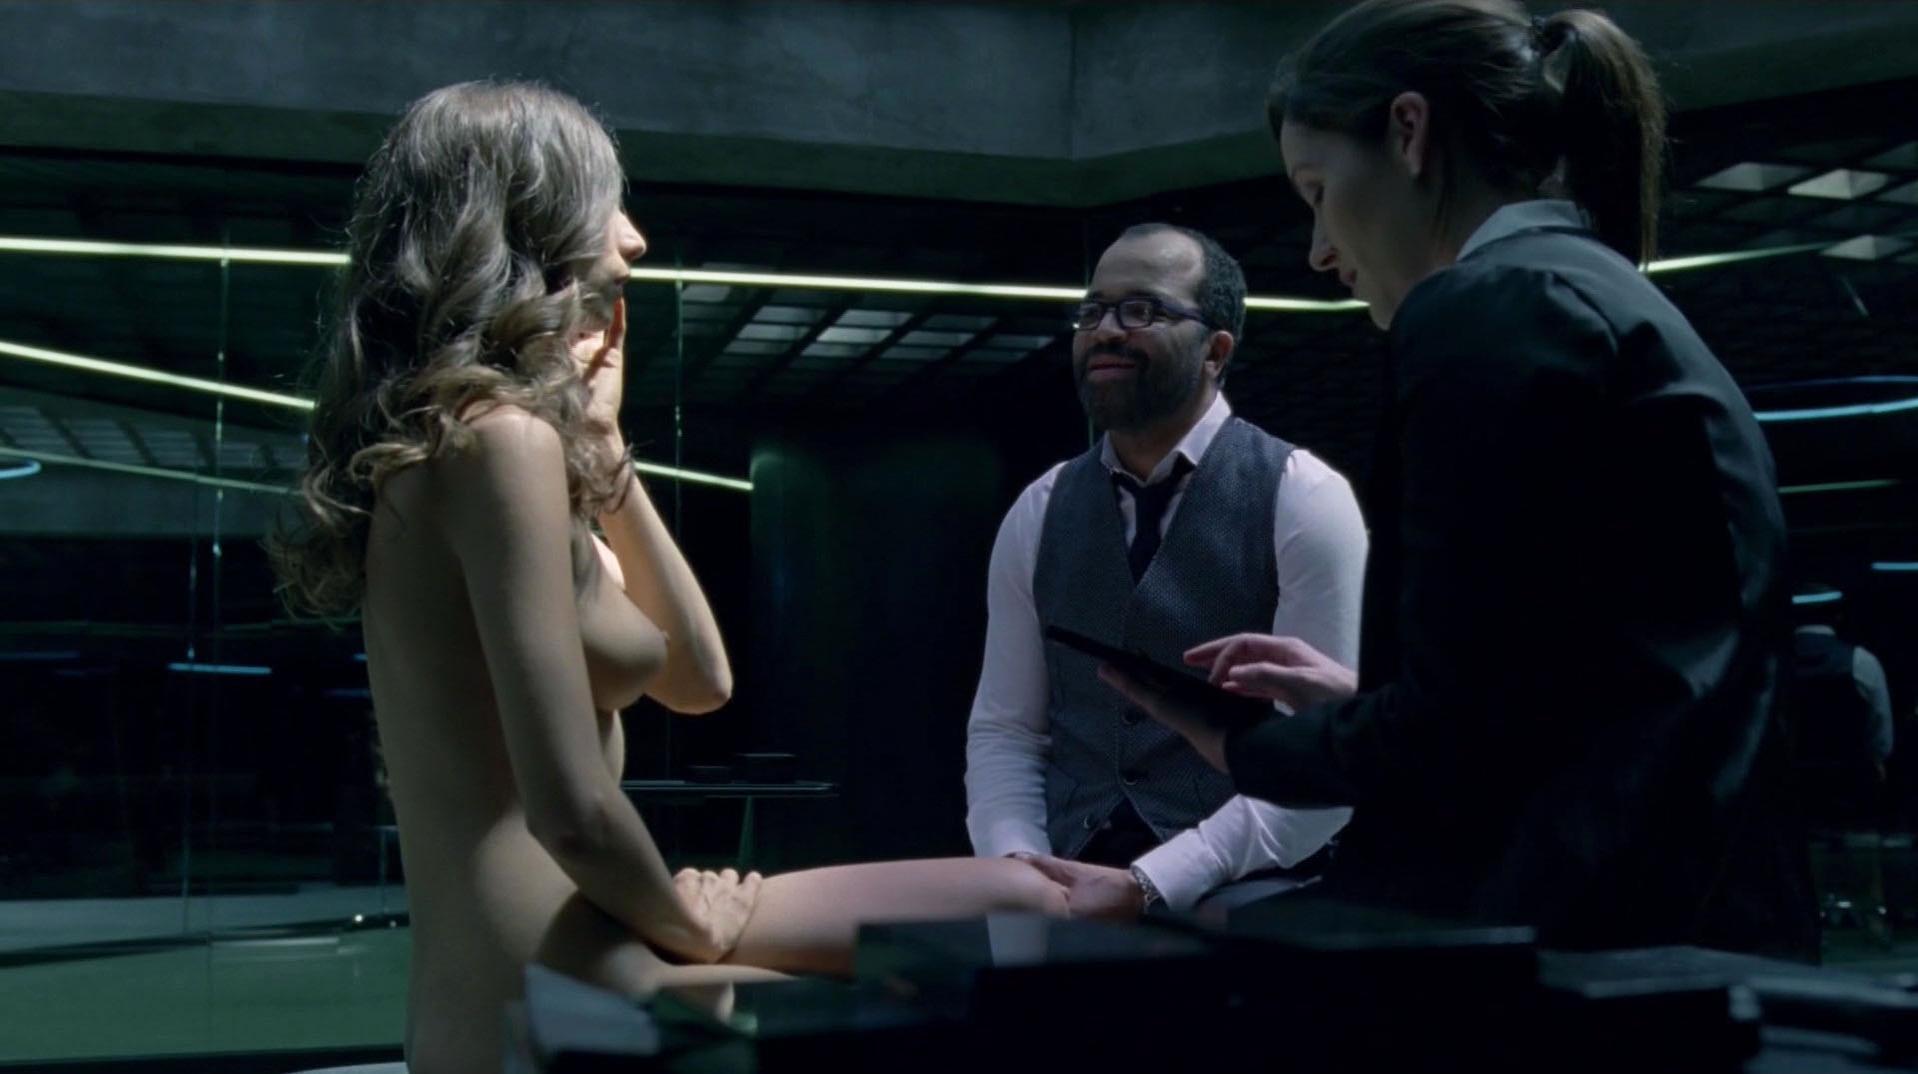 Angela Sarafyan nude - Westworld s01e01 (2016)